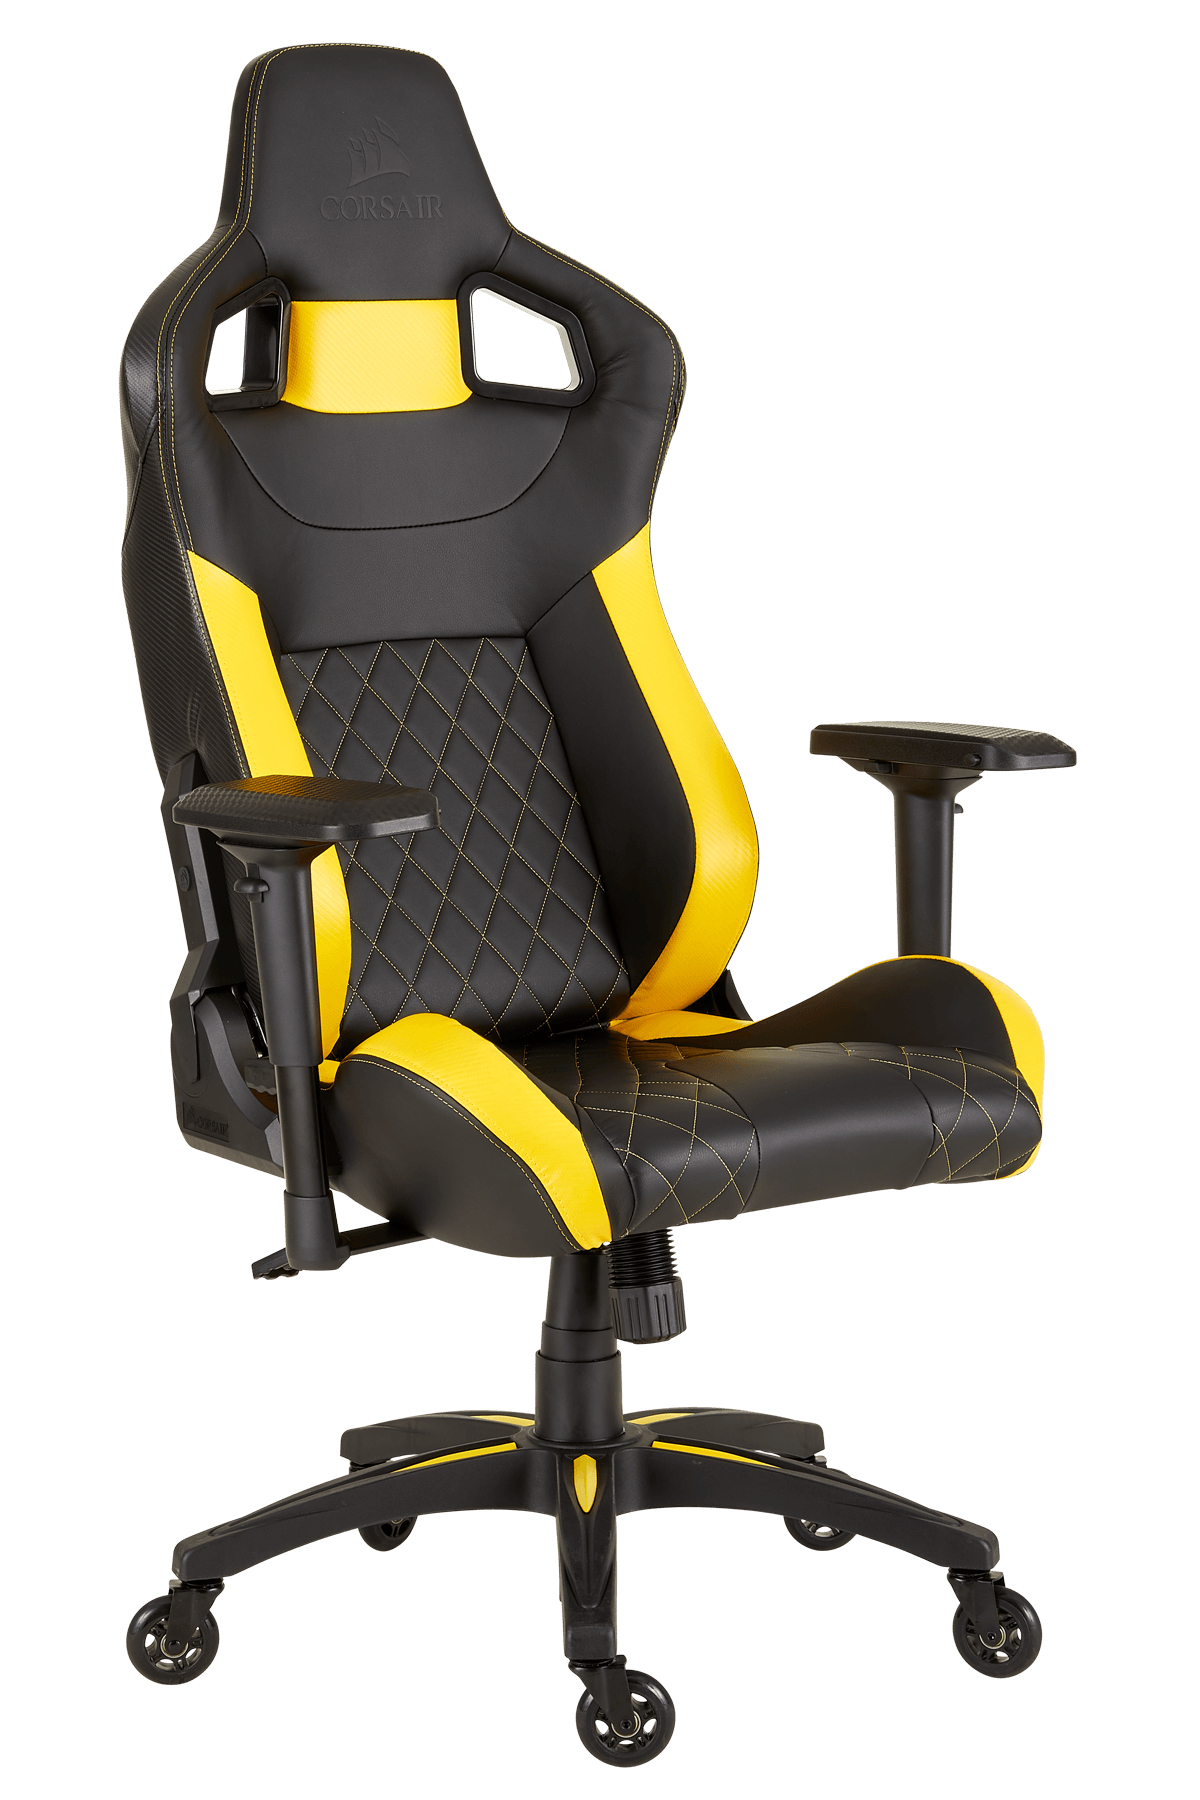 Corsair T1 Race - PC-Spielstuhl - 120 kg - Rennen - Nylon - Schwarz - Metall